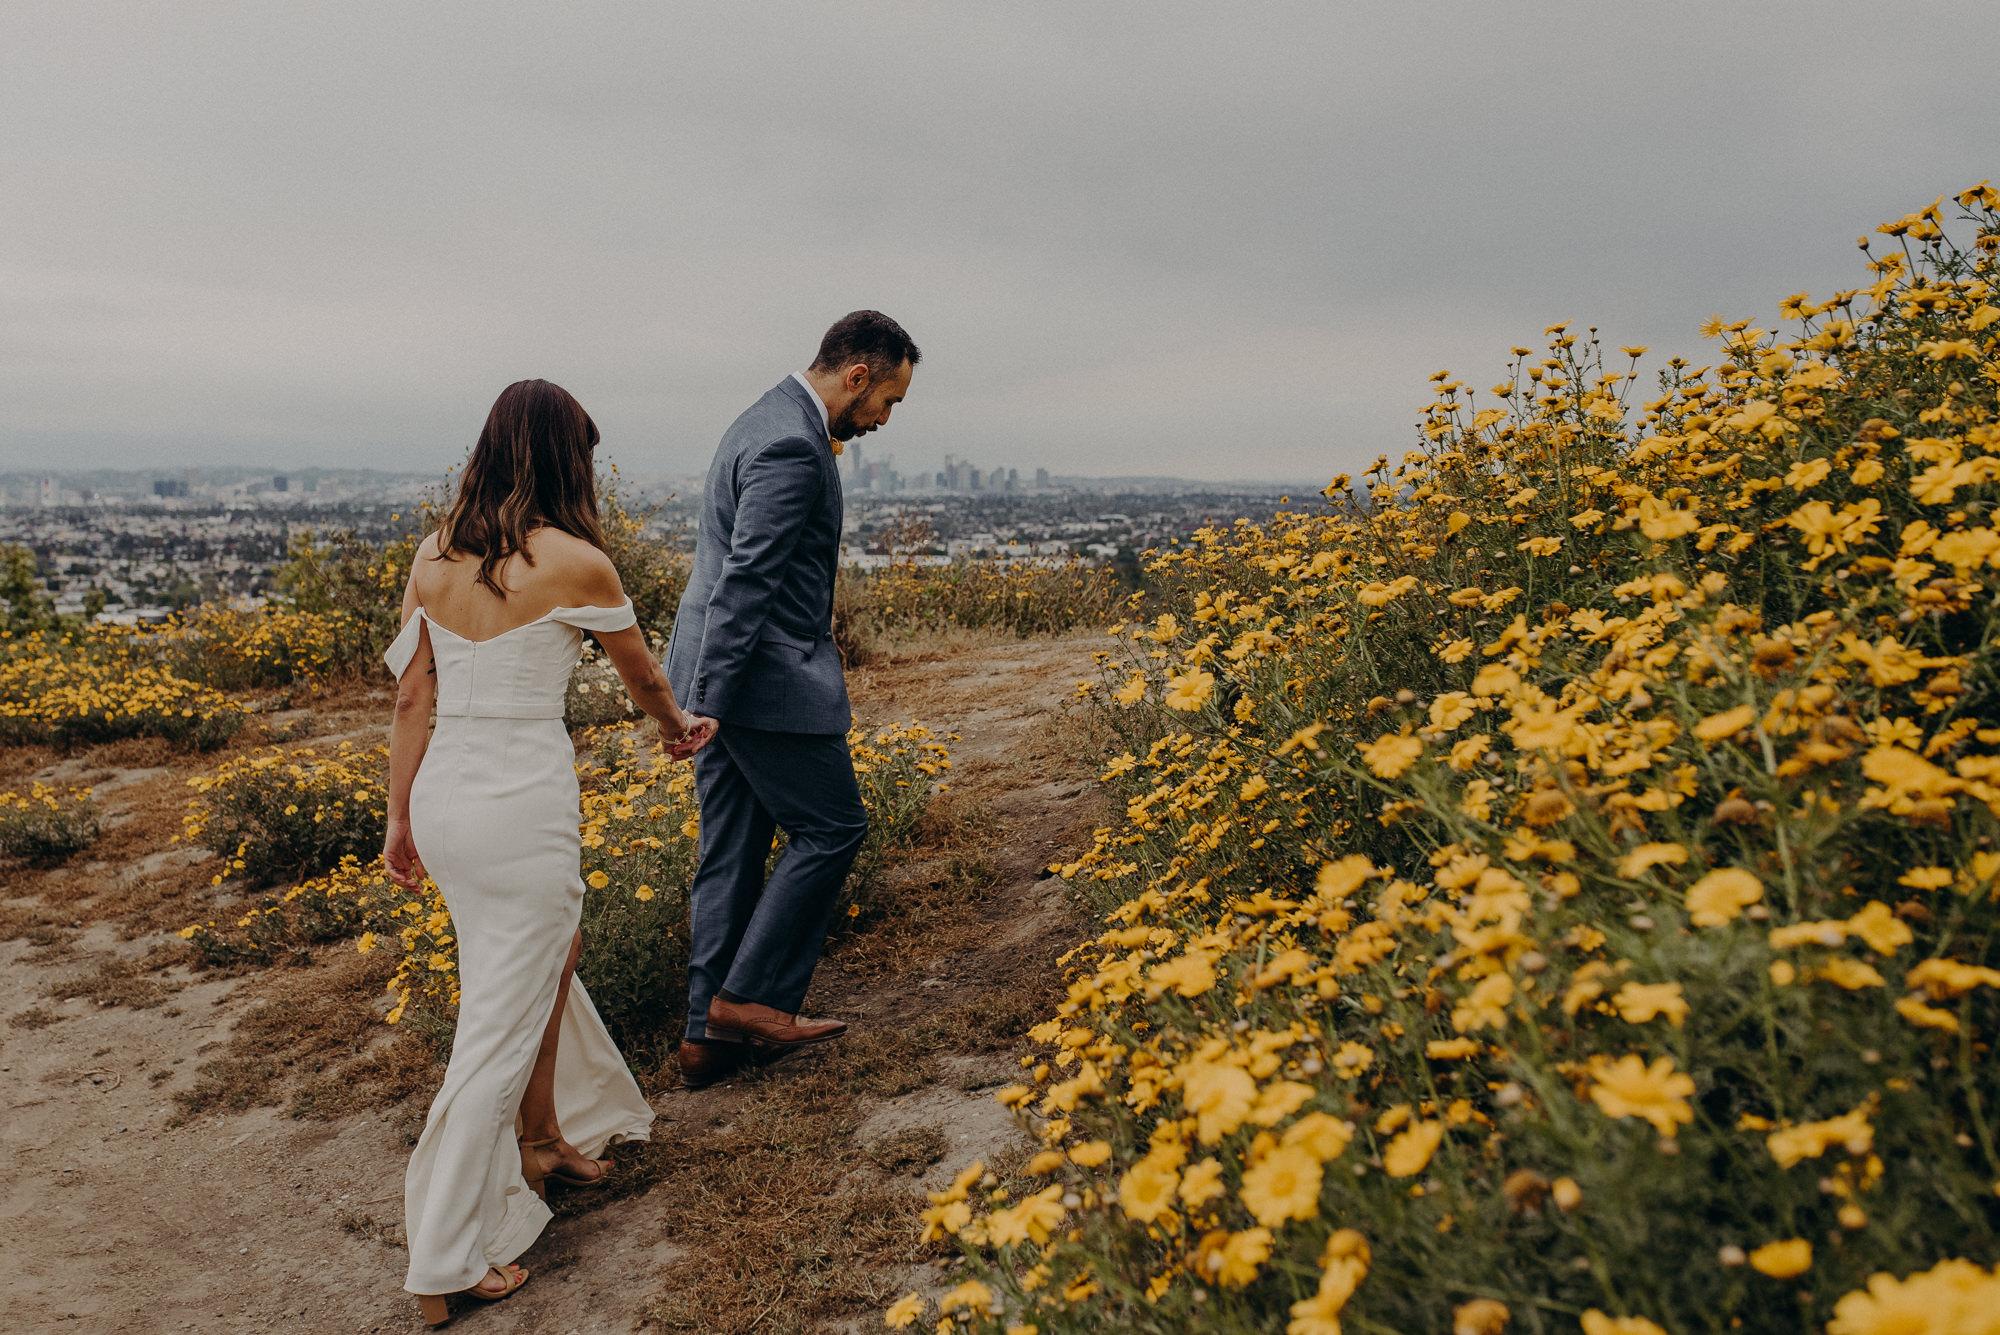 elopement photographer in los angeles - la wedding photographer - isaiahandtaylor.com-046.jpg